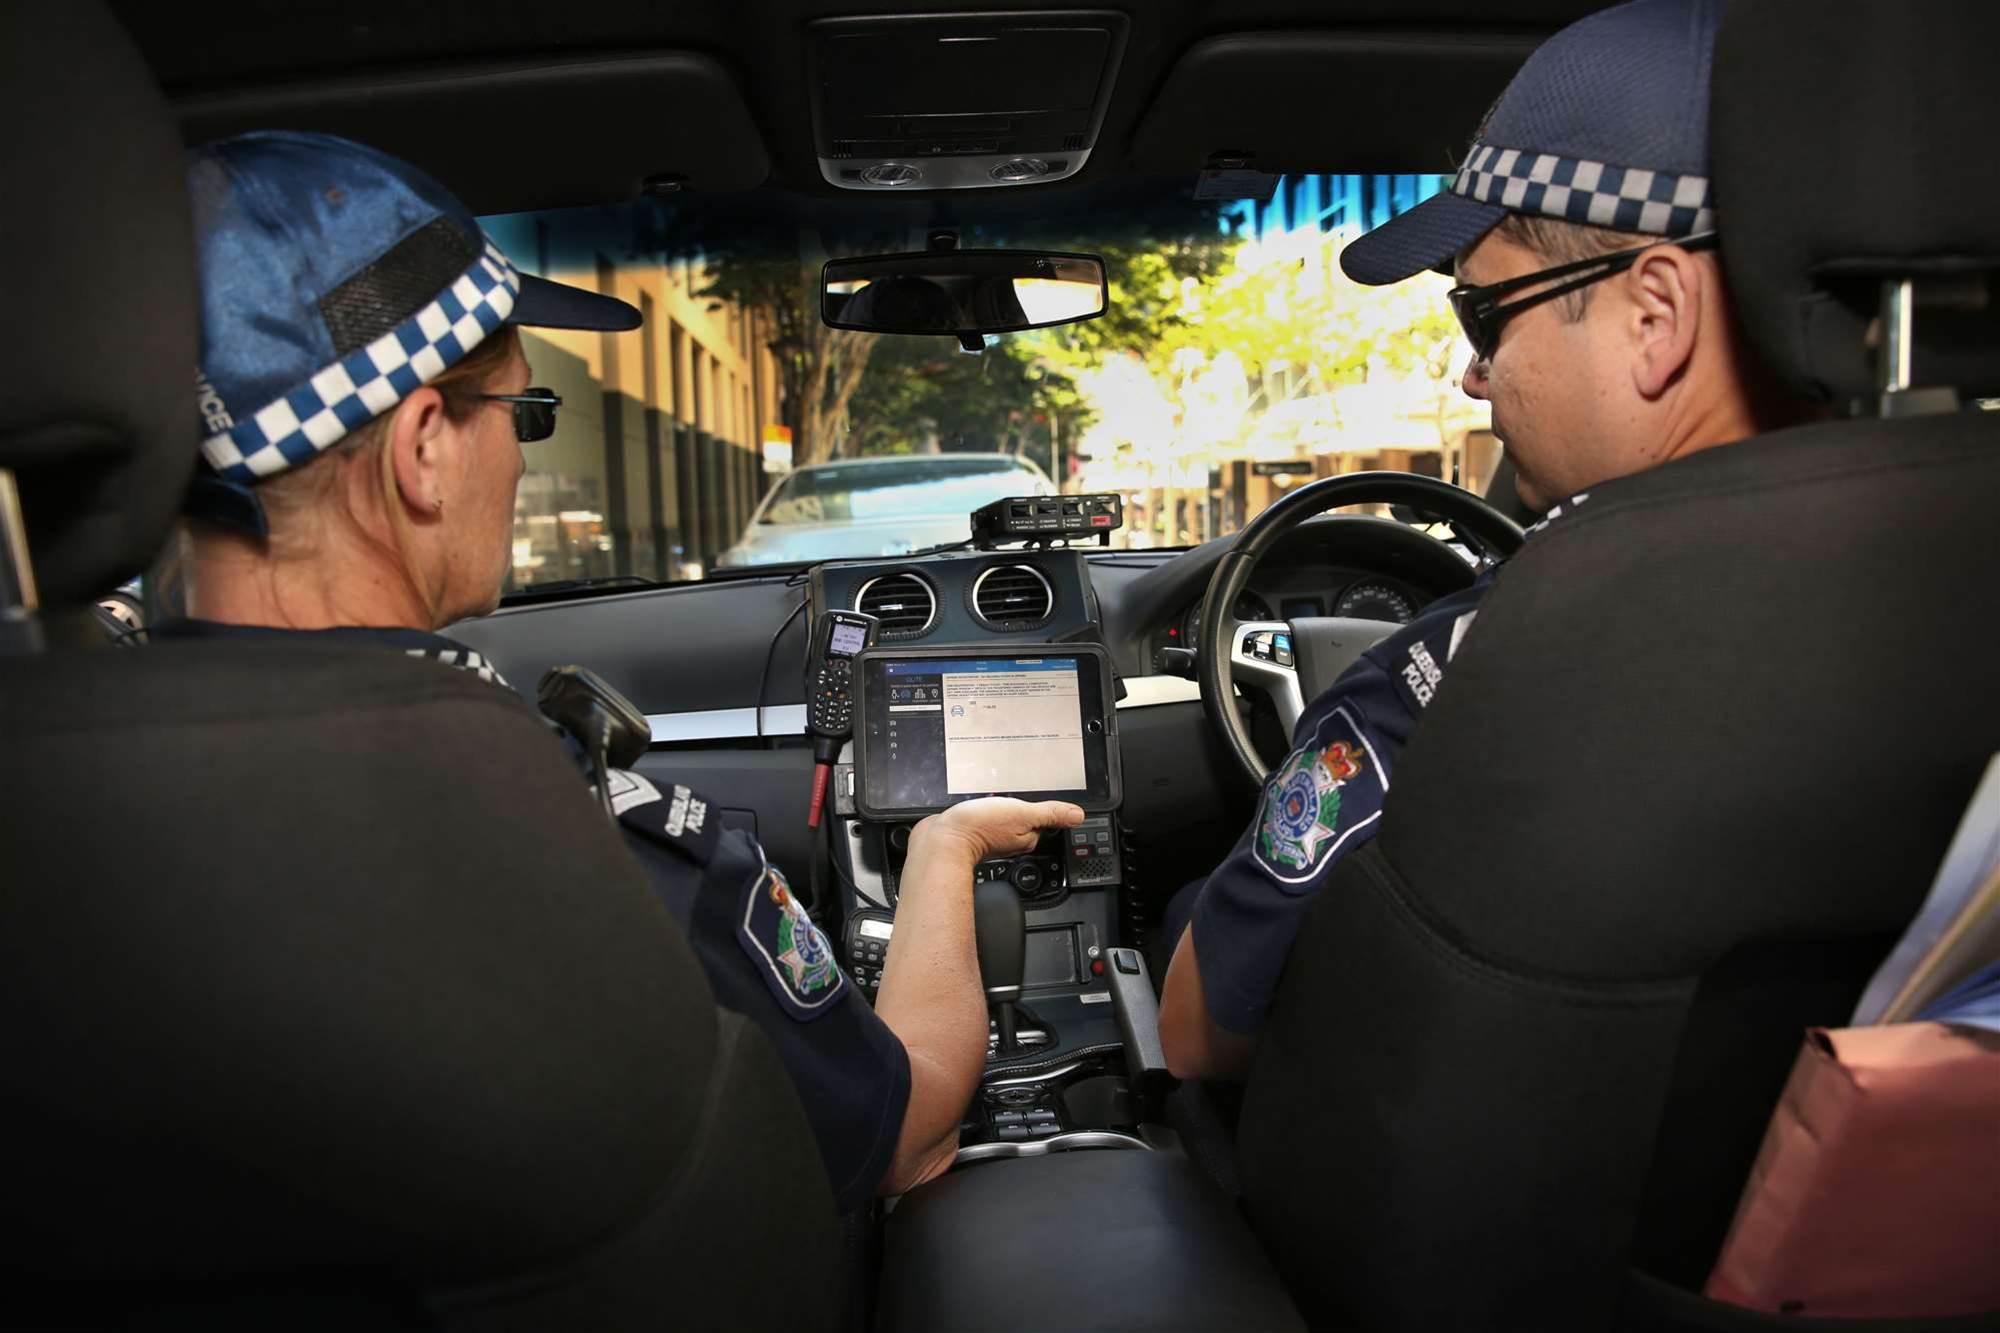 Qld Police pilots iPad traffic infringement notices app